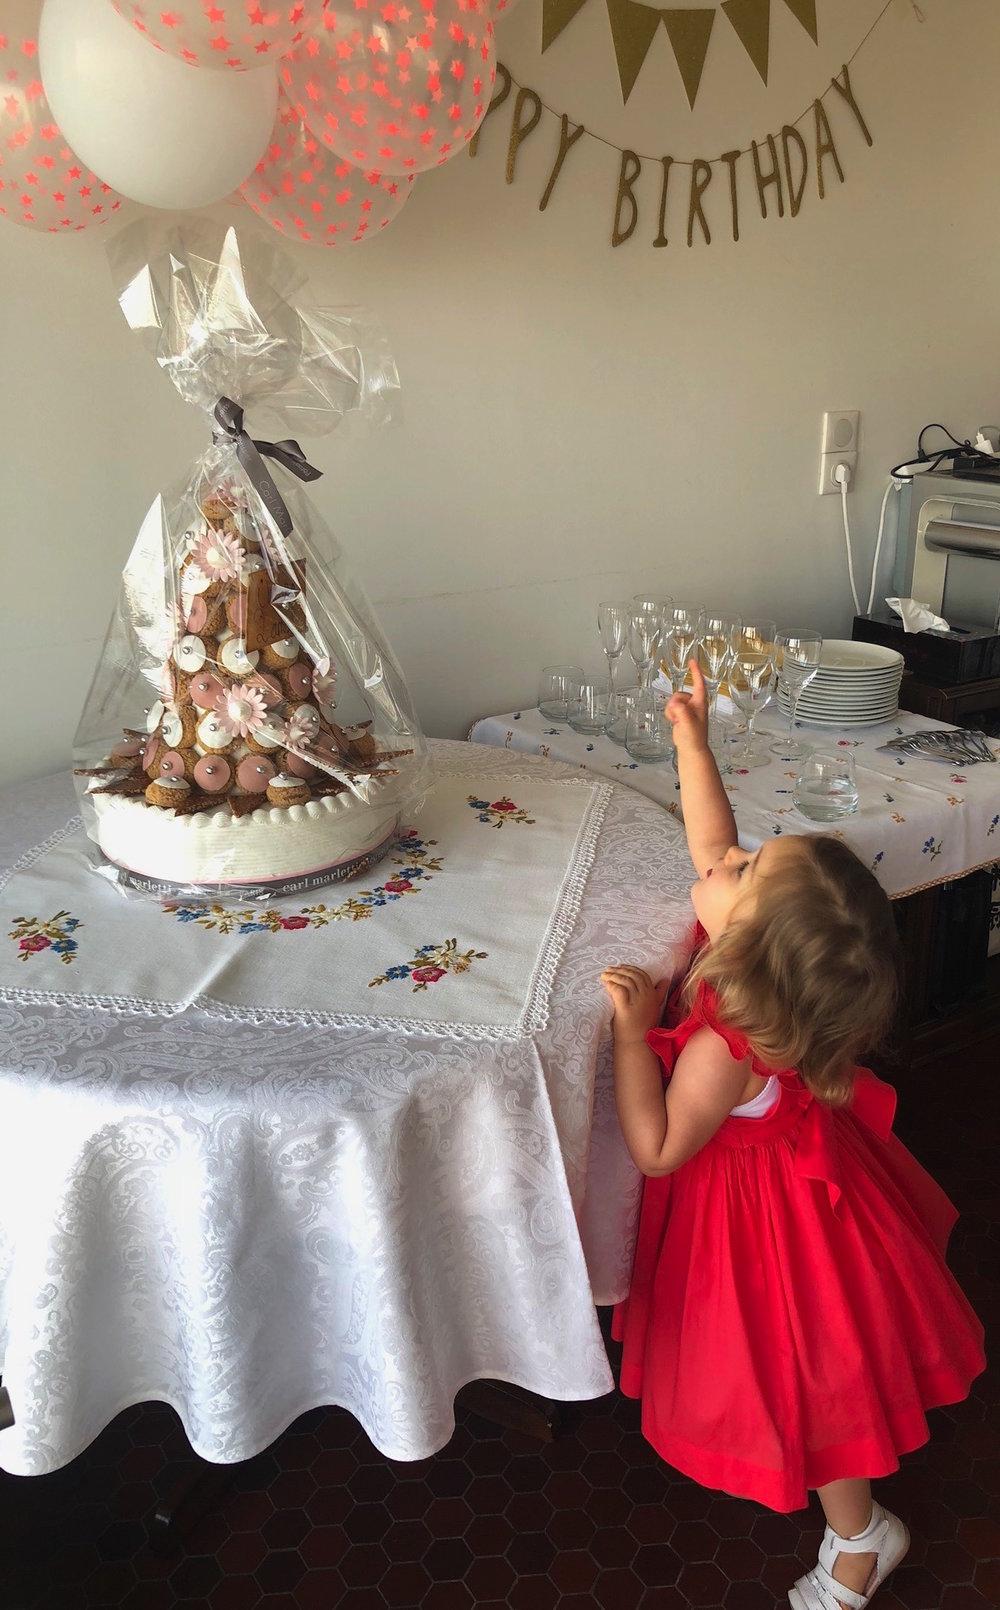 Darling Chiara celebrating her birthday in our red Poppy Netti dress